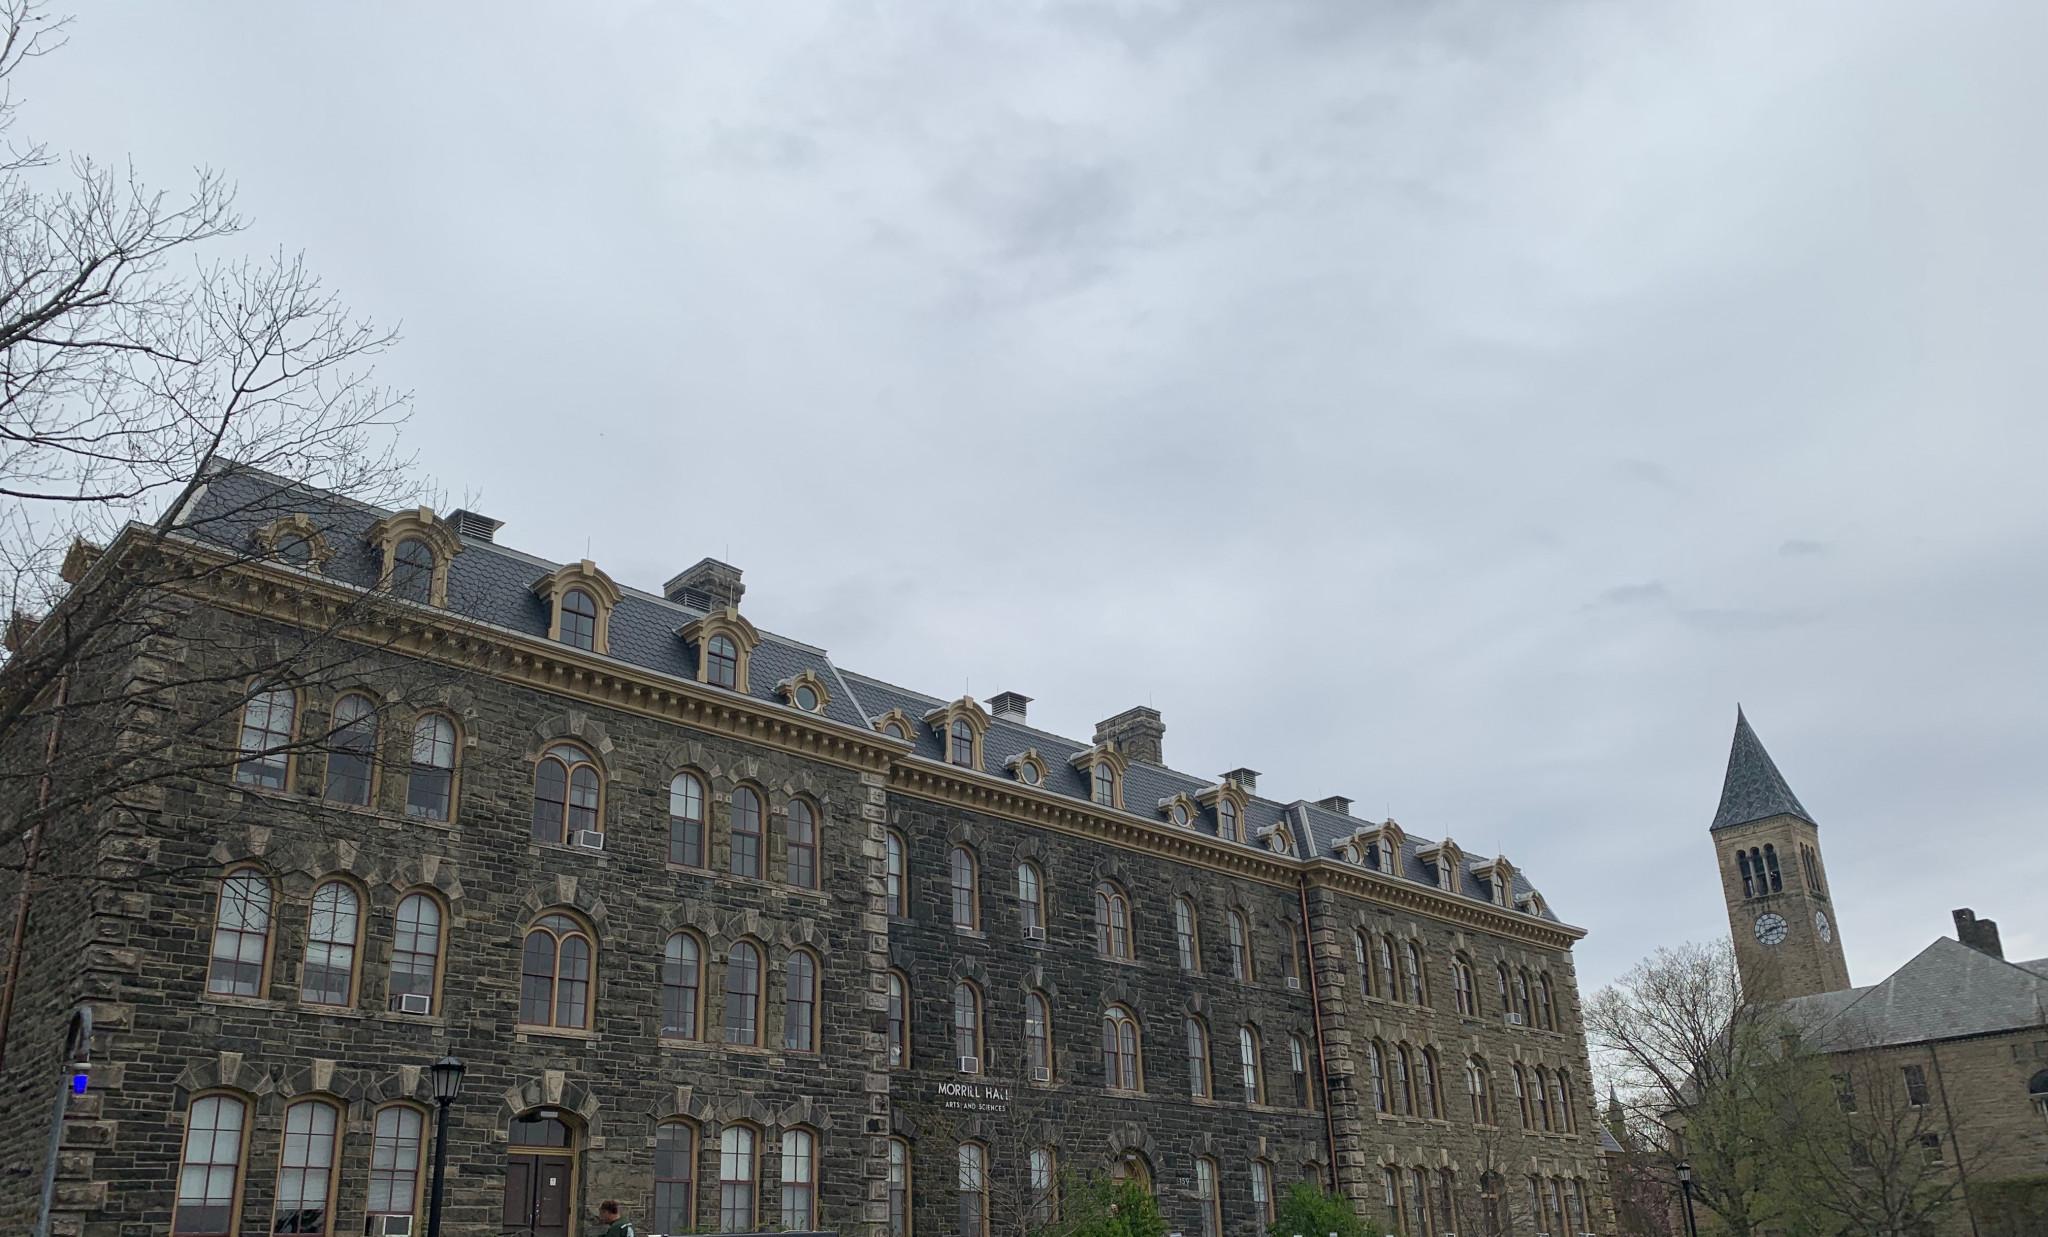 Morrill Hall Cornell University Evans Roofing Company